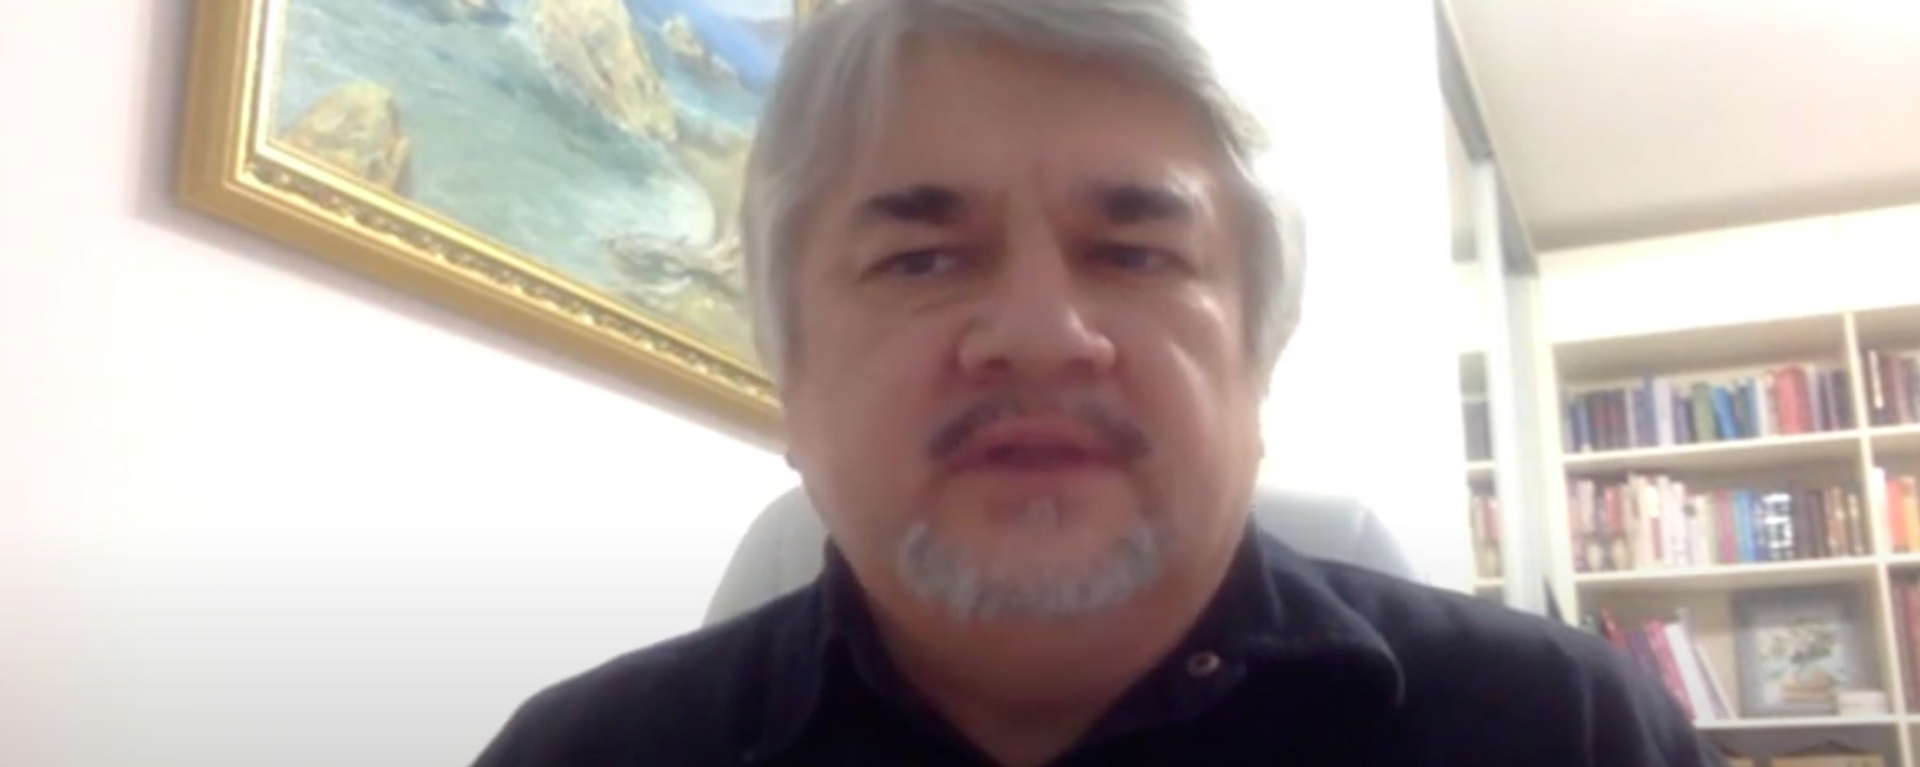 Ищенко: В Афганистане верхушка талибов научилась носить смокинг, а на Украине верхушка деградировала - Sputnik Узбекистан, 1920, 20.09.2021